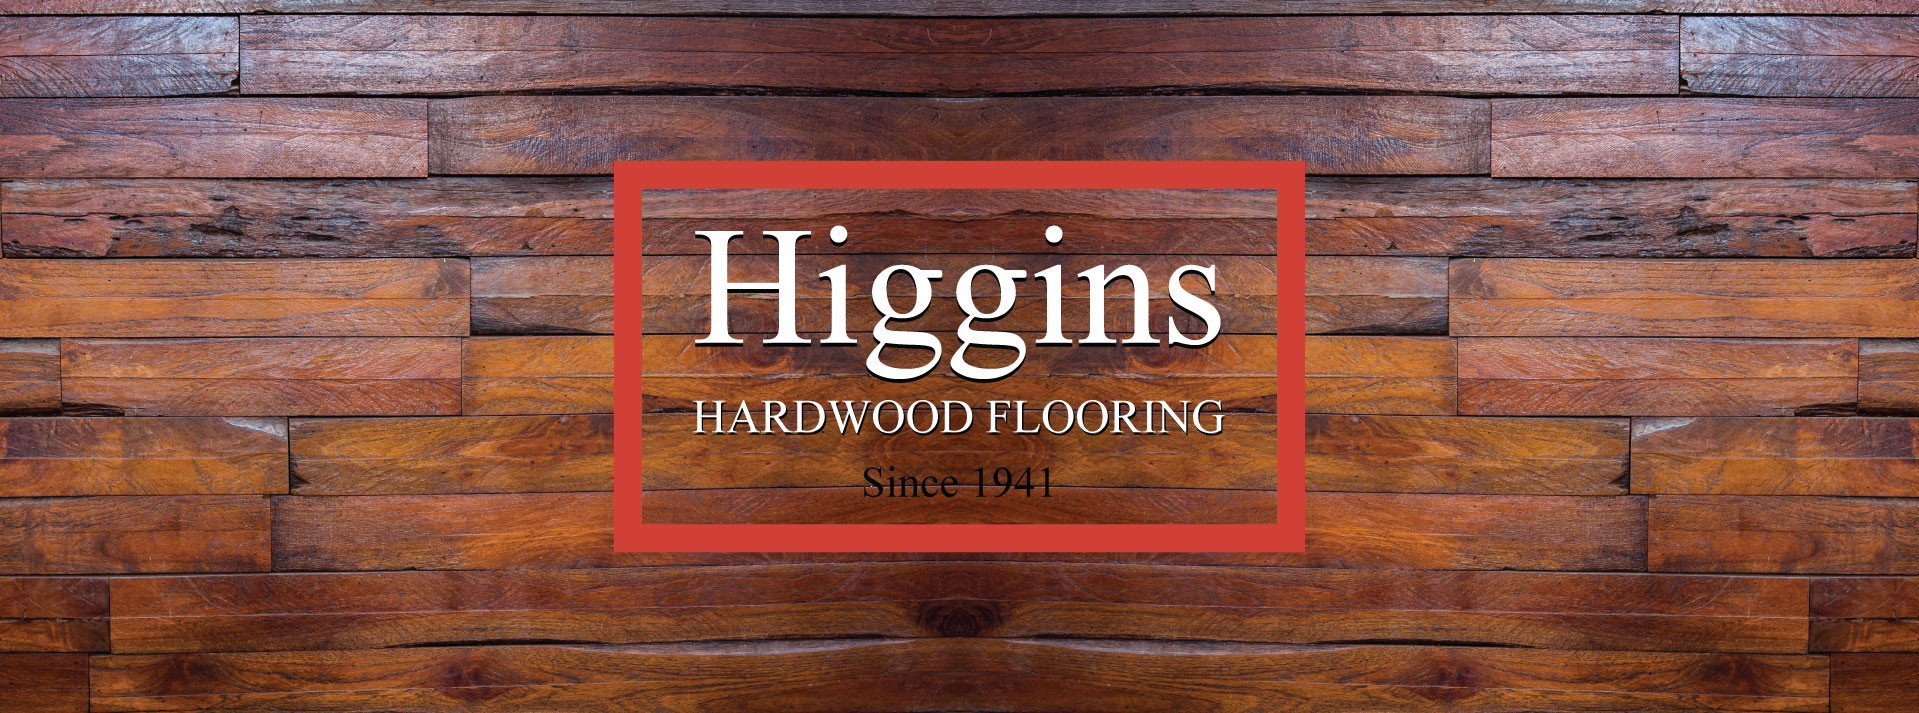 hardwood flooring inc elmsford ny of higgins hardwood flooring in peterborough oshawa lindsay ajax pertaining to office hours